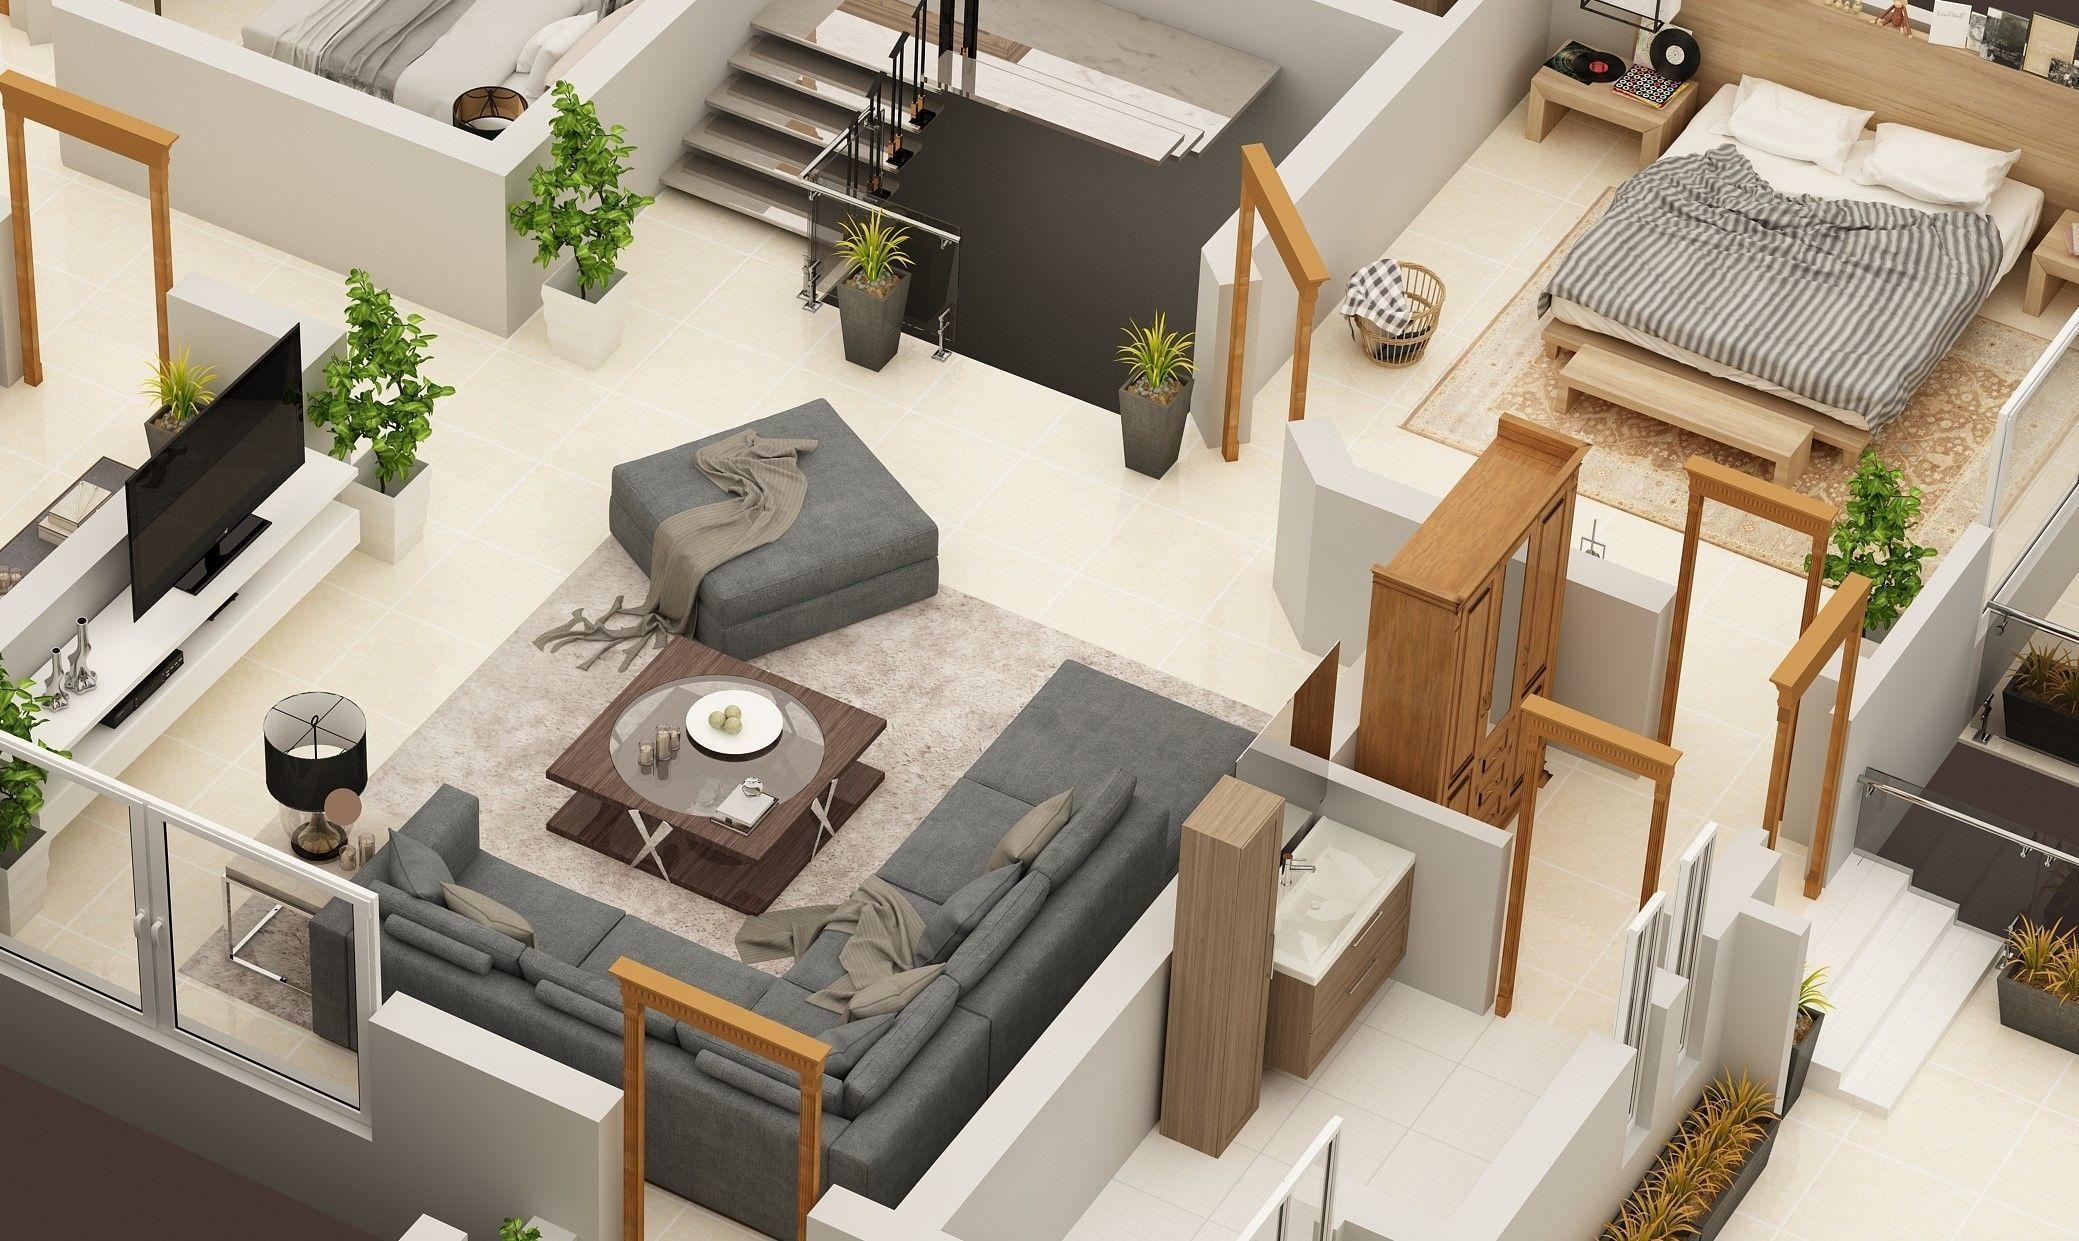 3D FLOOR PLAN OF 1 KANAL RESIDENCE FIRST FLOOR House